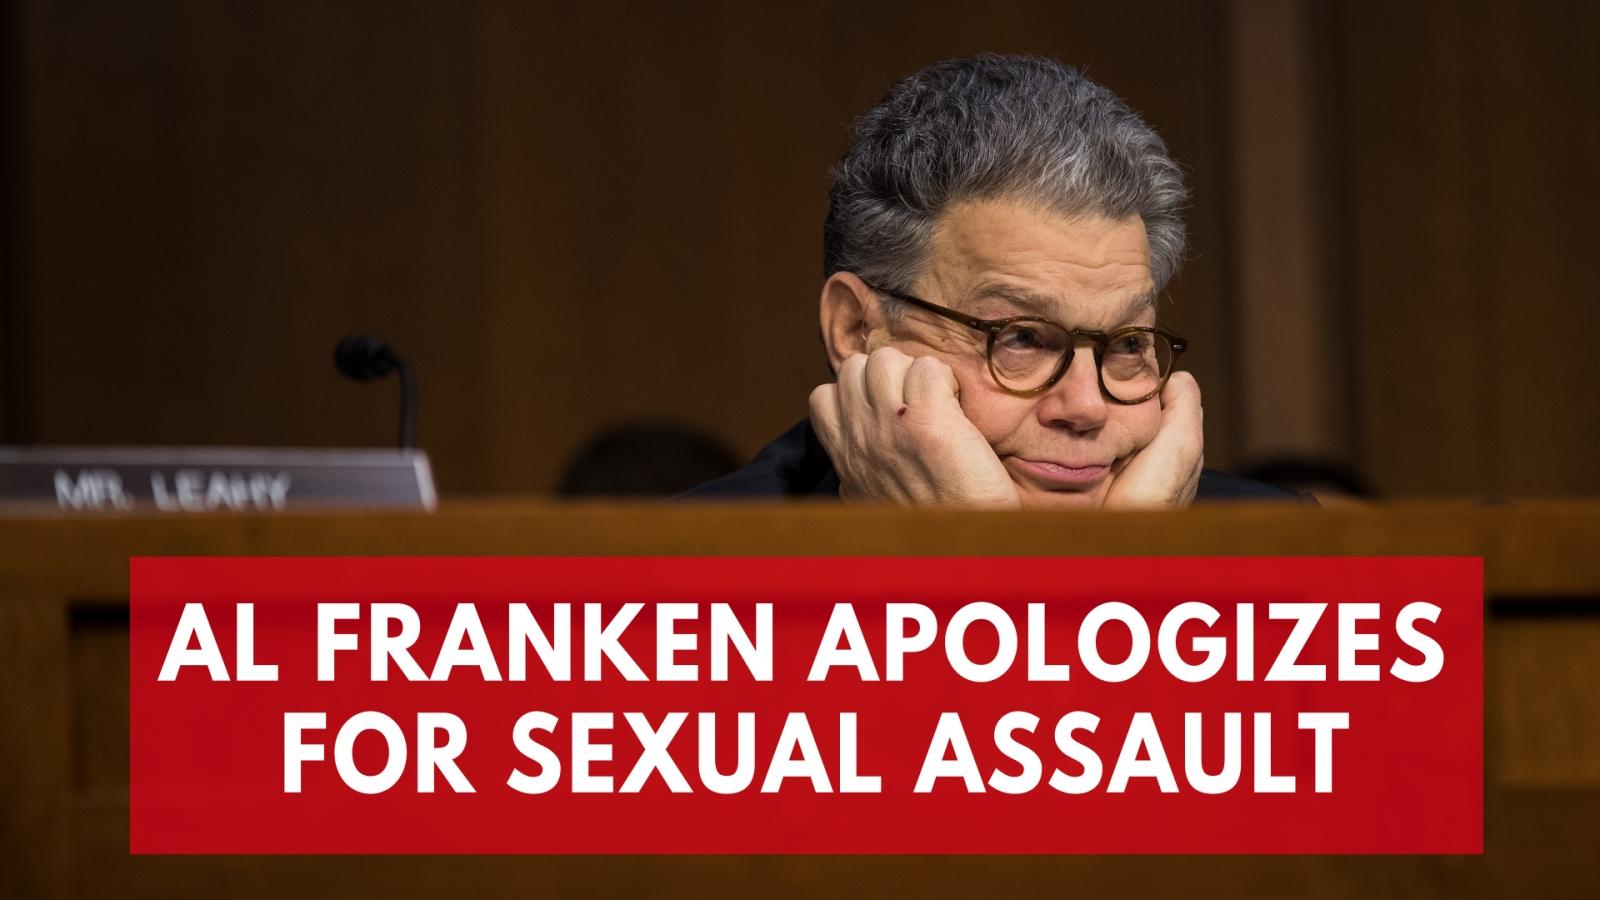 Senator Al Franken apologizes following sexual assault accusations from Los Angeles radio hostLeeann Tweeden